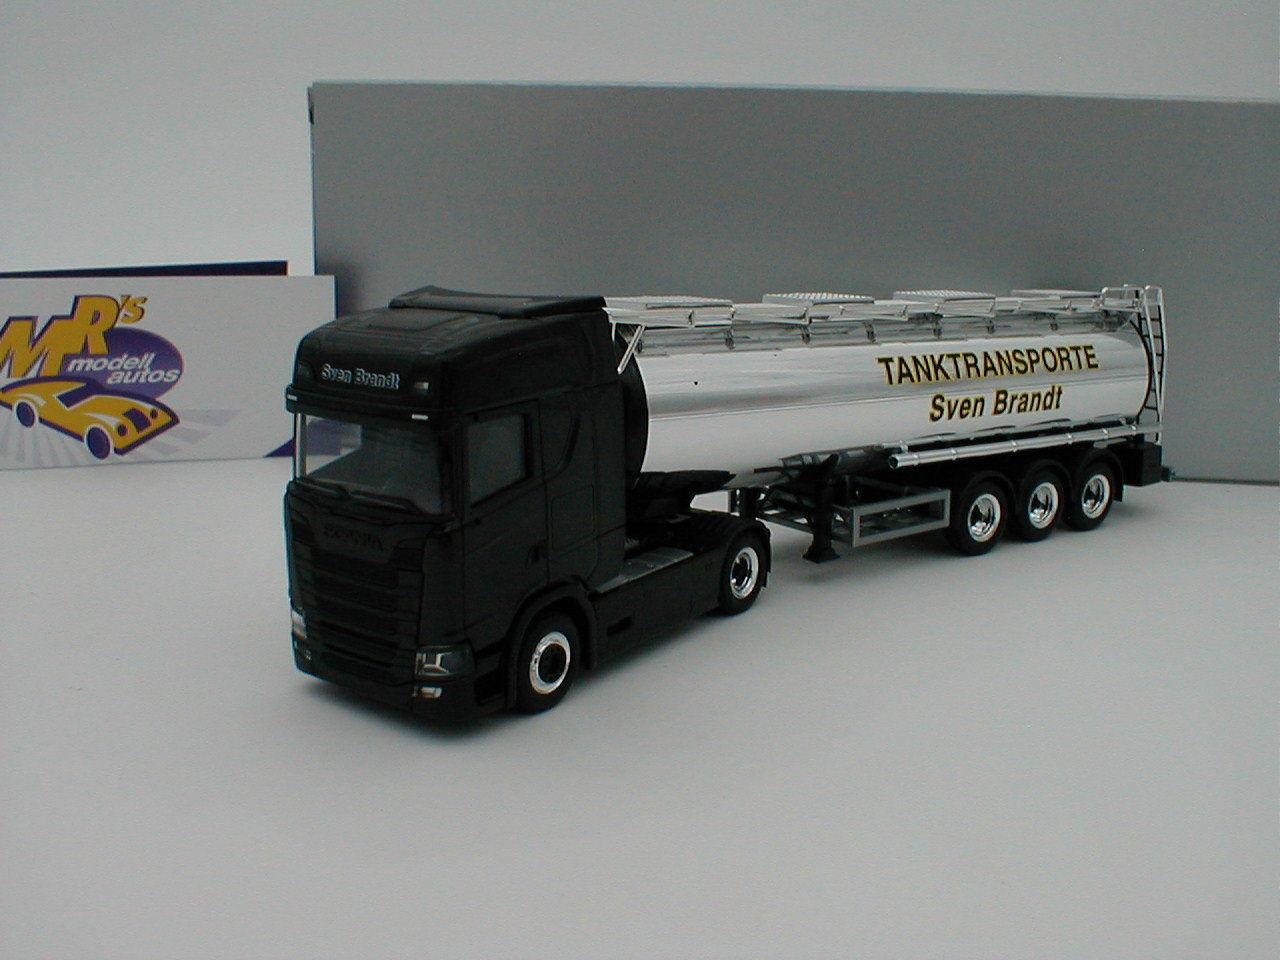 Herpa 932684 - Scania CS HD Tank-Sattelzug   Tanktransporte Sven Brandt   1 87